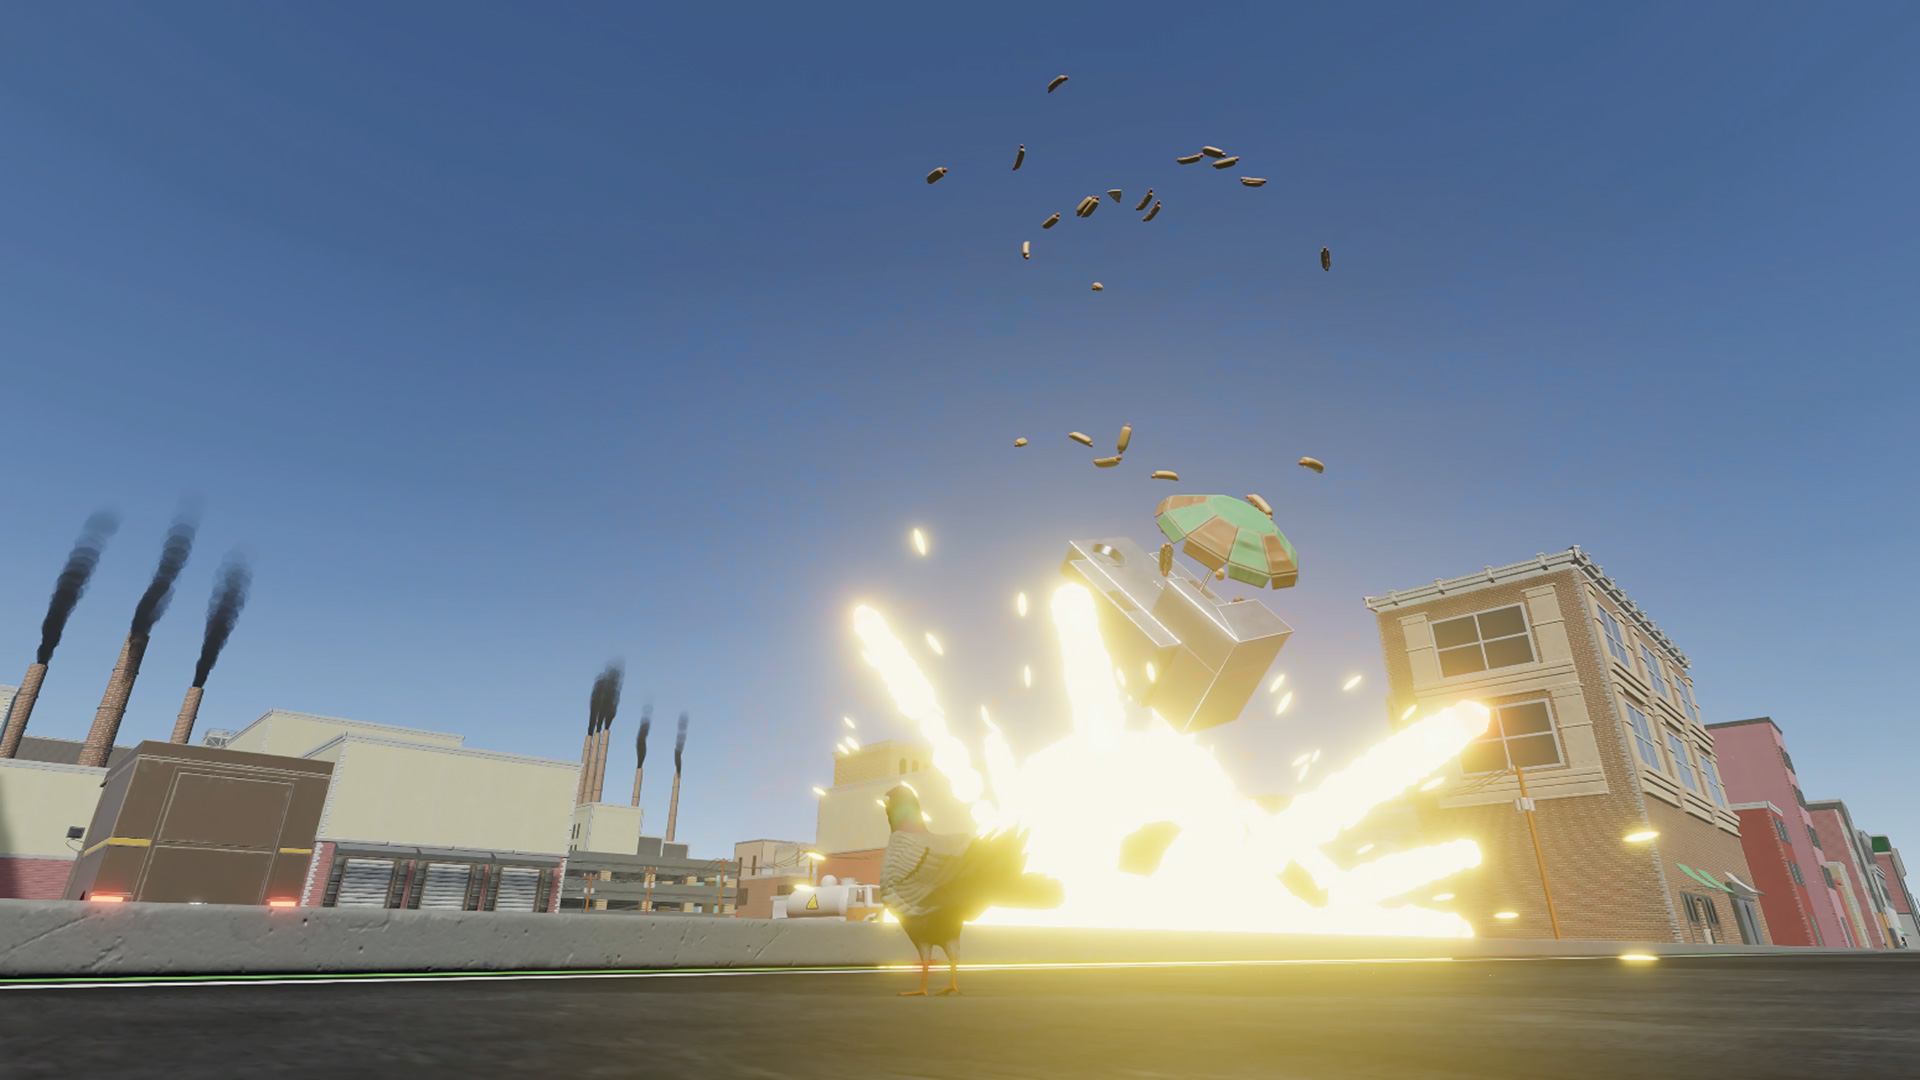 Hot dog cart explosion   Pigeon